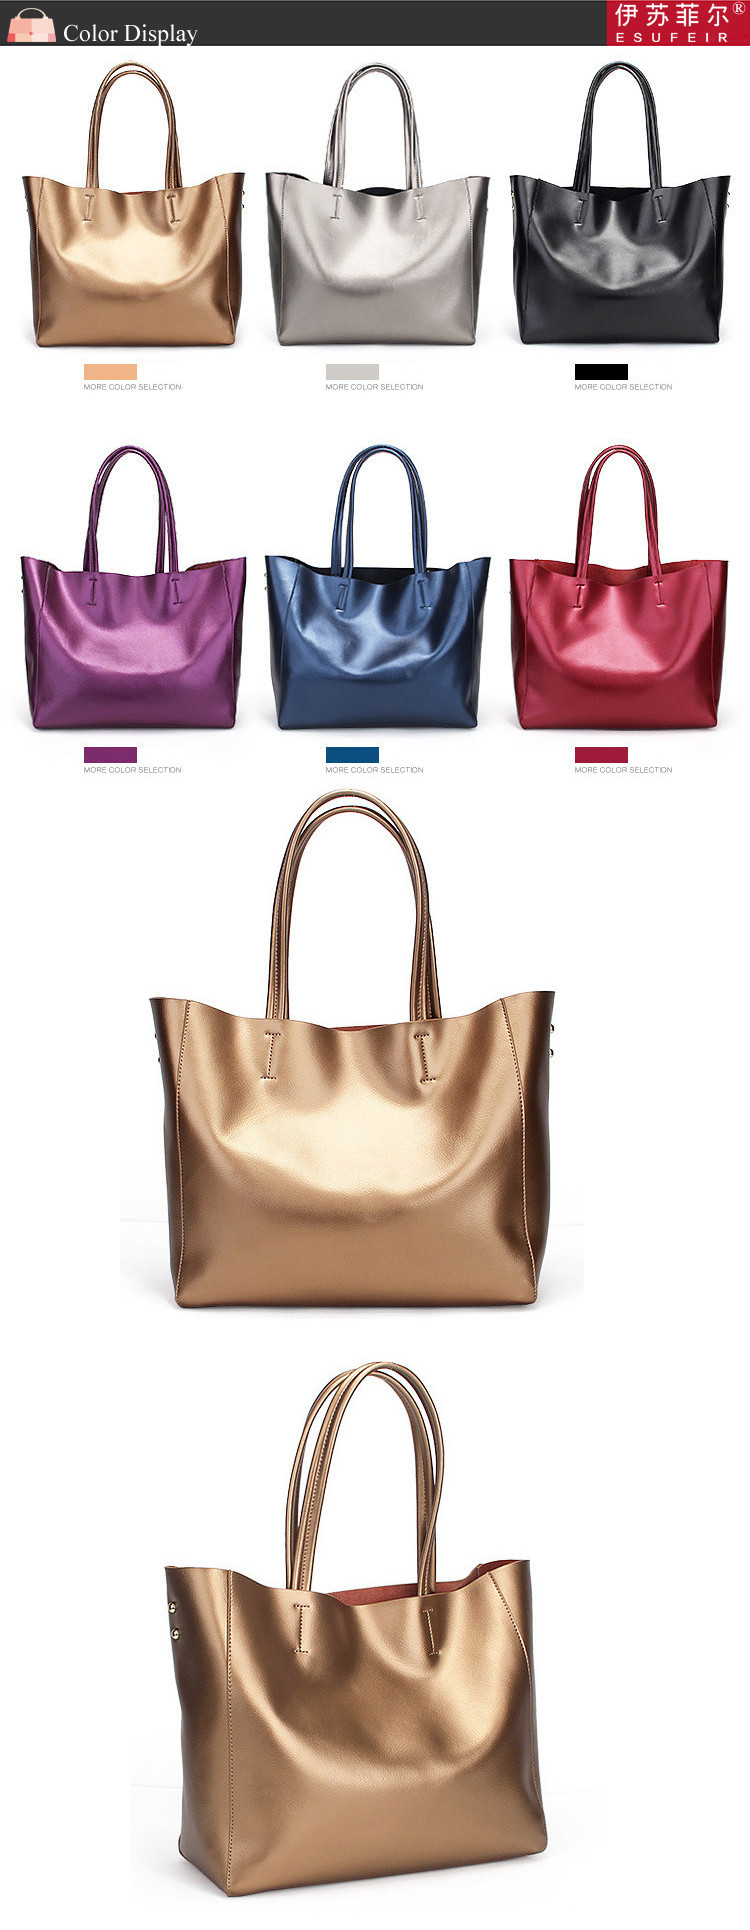 ladise-bag-11